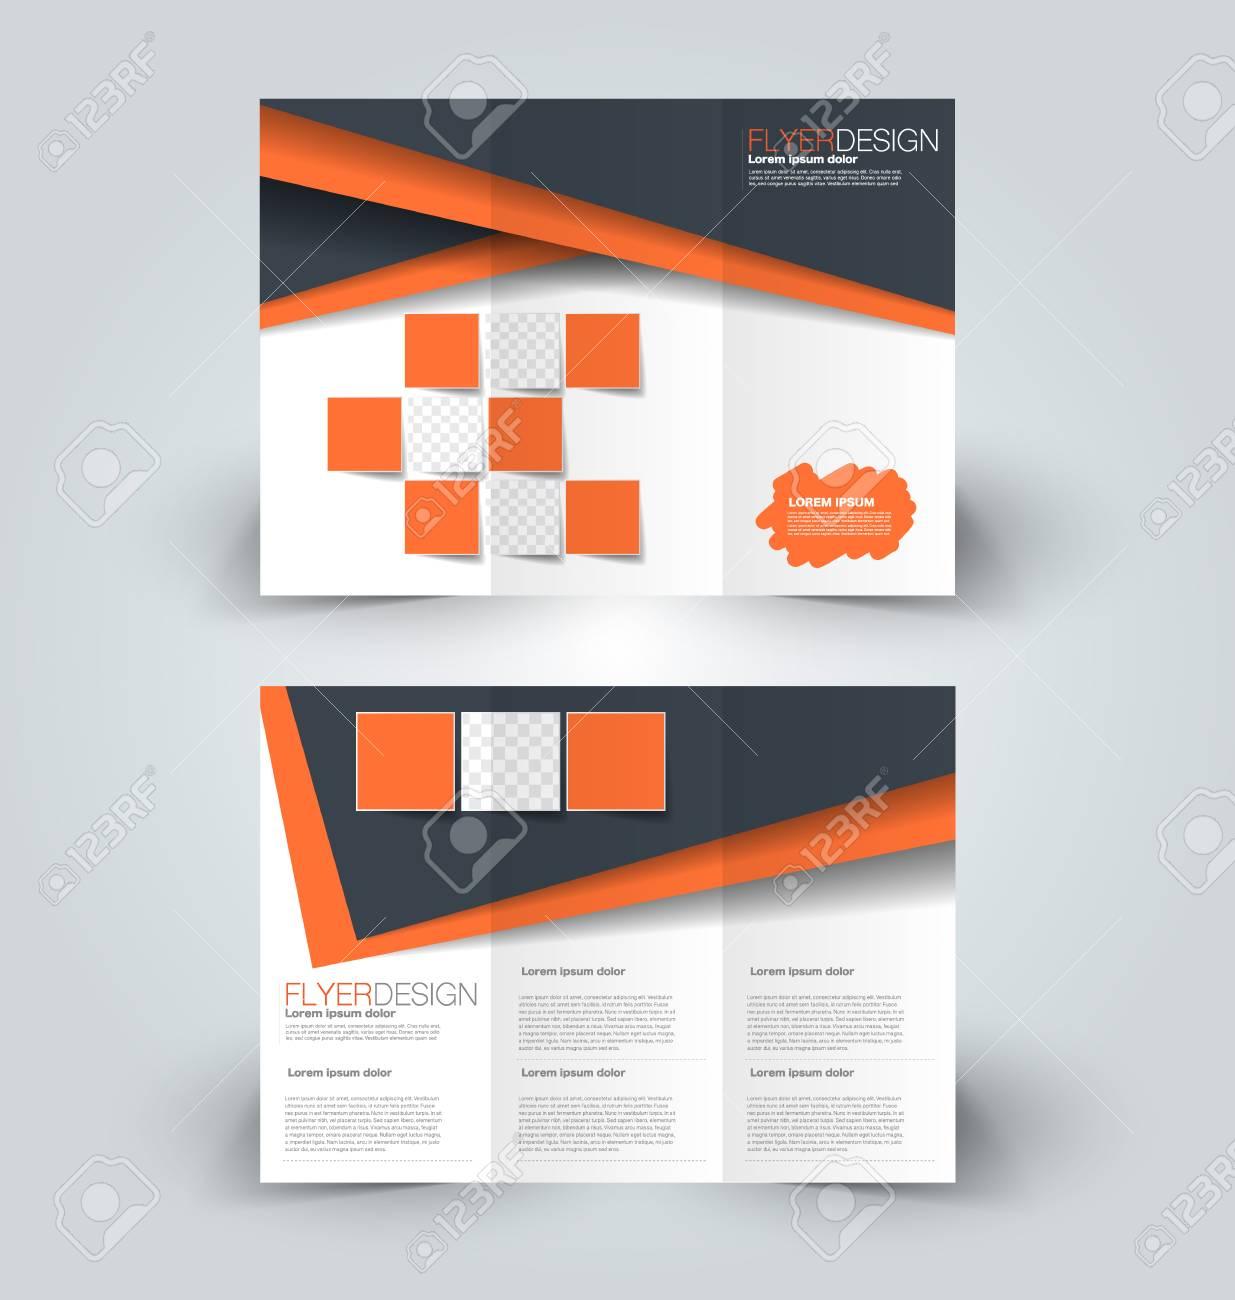 Tri fold brochure design creative business flyer template editable tri fold brochure design creative business flyer template editable vector illustration orange and flashek Gallery